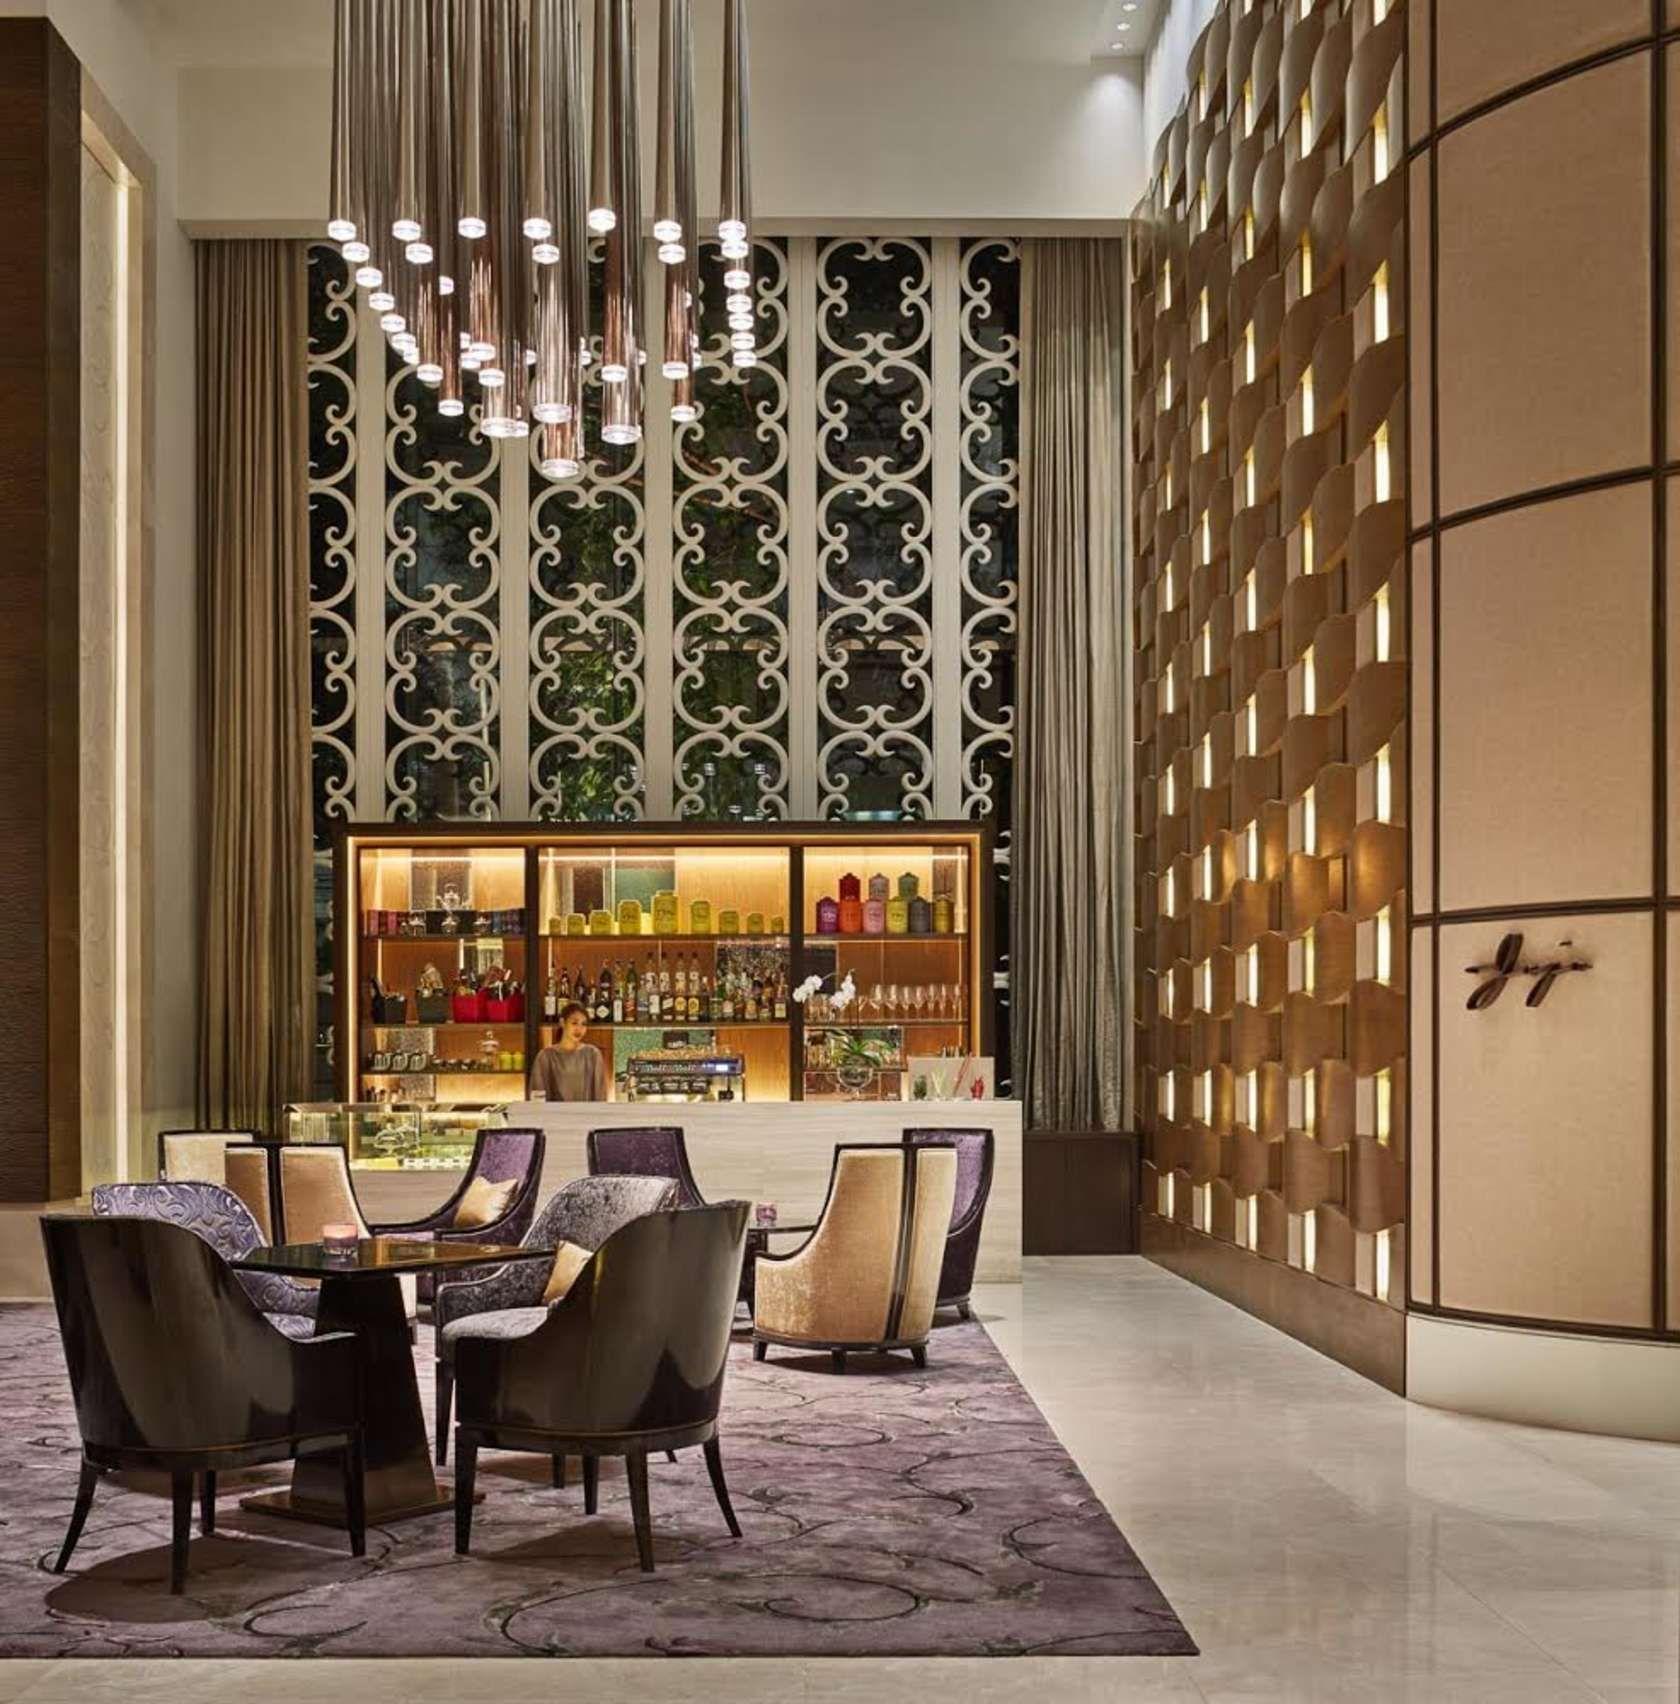 Das wohnzimmer bangkok geometrie lounges spa straßen jojo restaurant